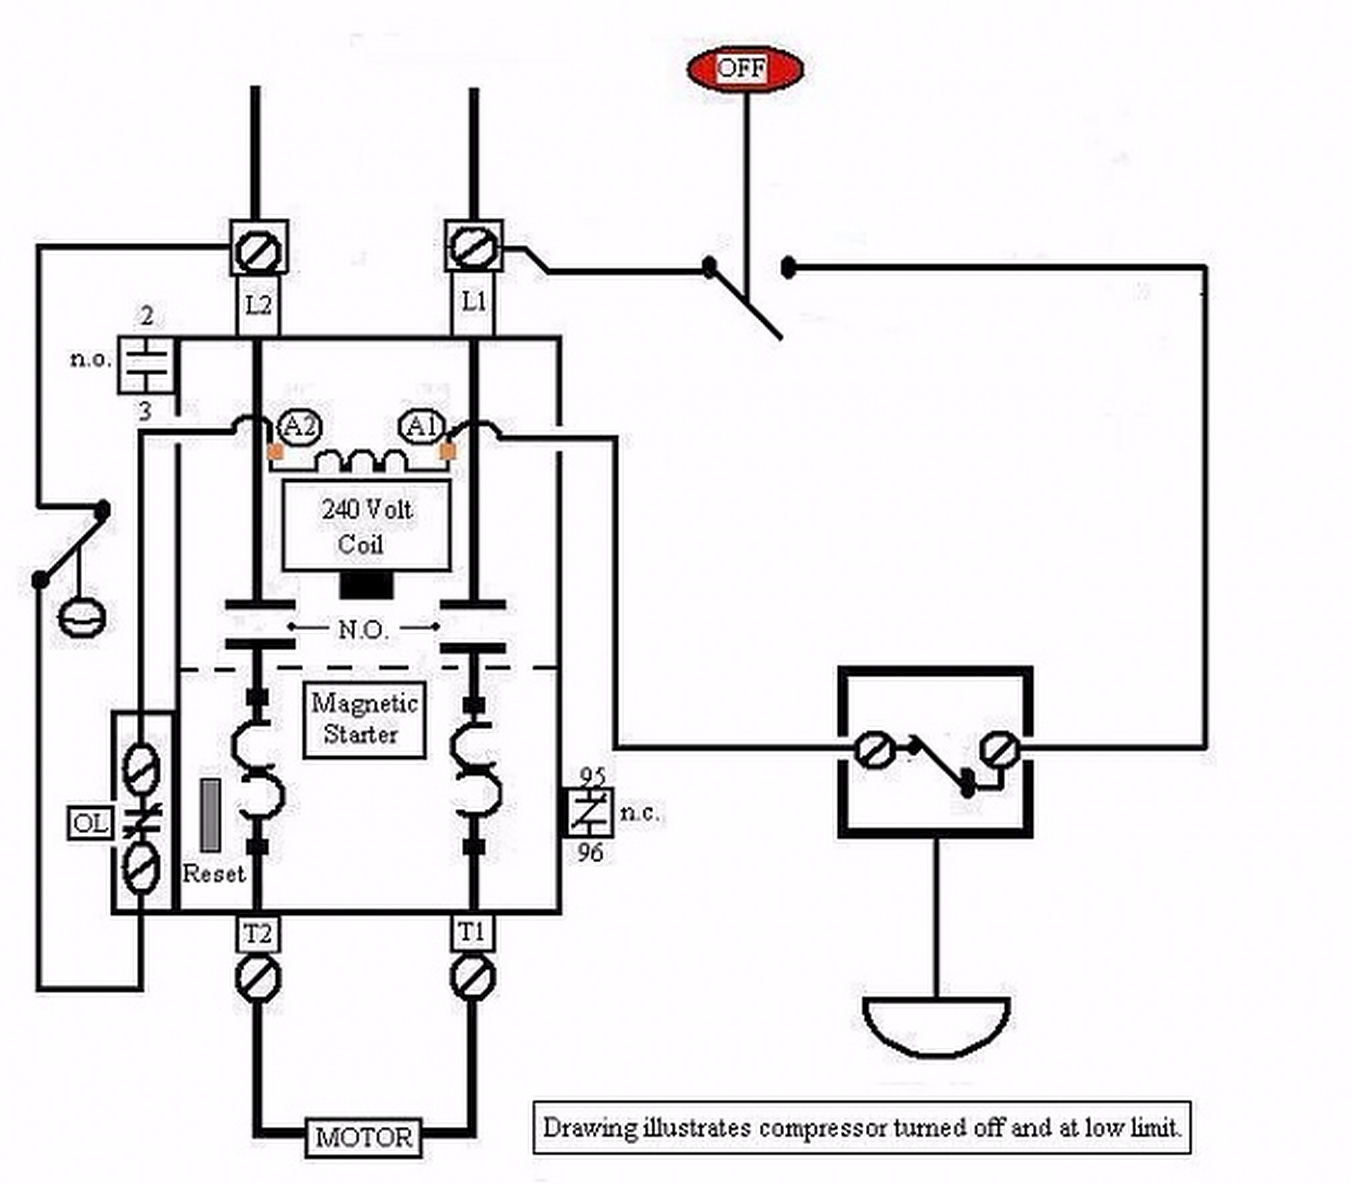 Help With Compressor Pressure Switch The Garage Journal Board